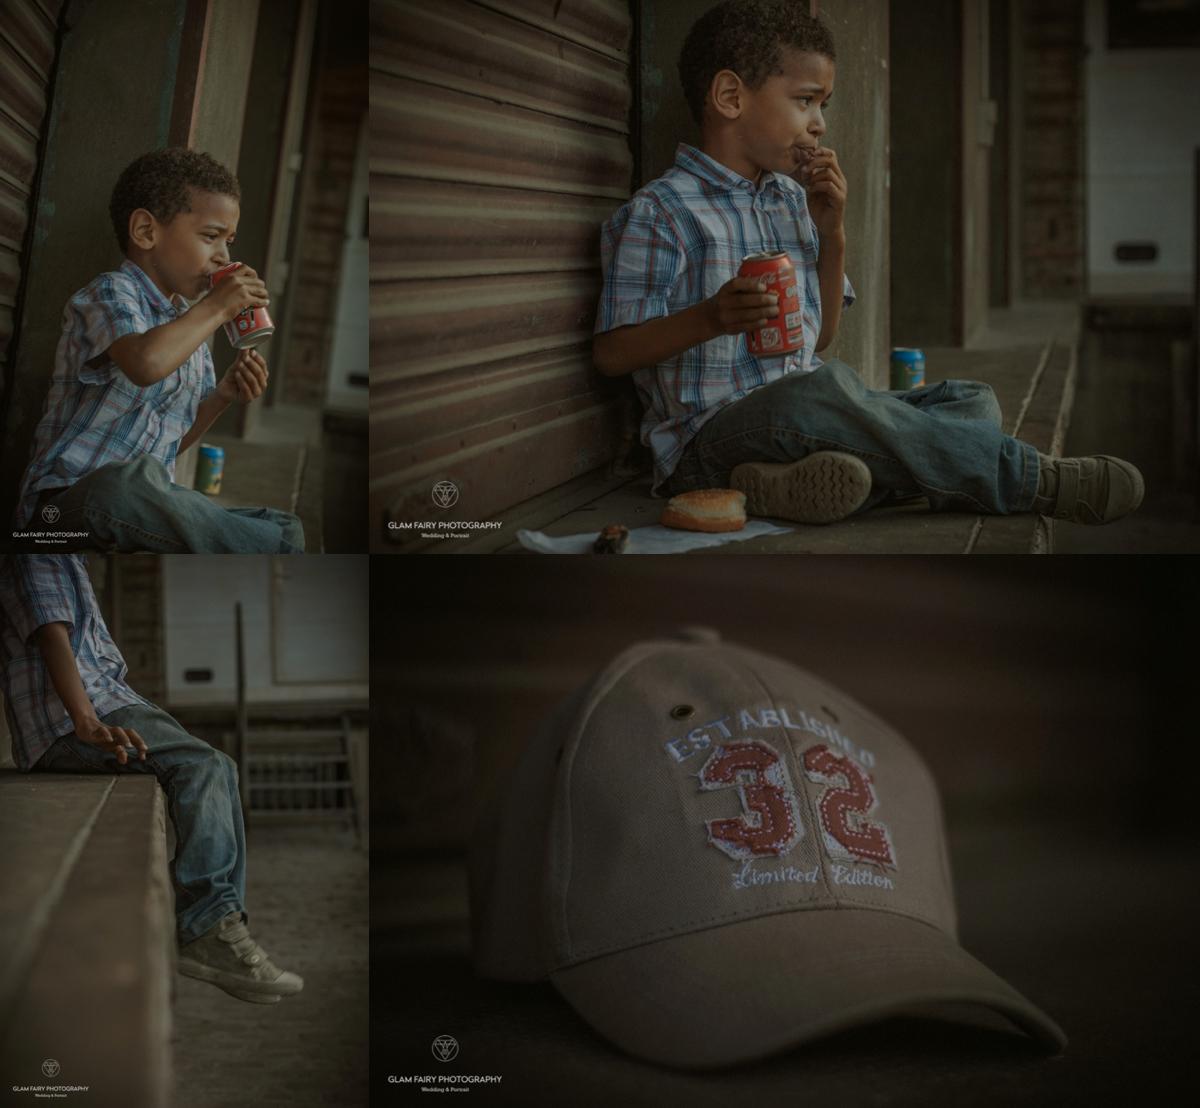 GlamFairyPhotography-photographe-seance-enfant-american vintage-alfortville-Nathan_0012